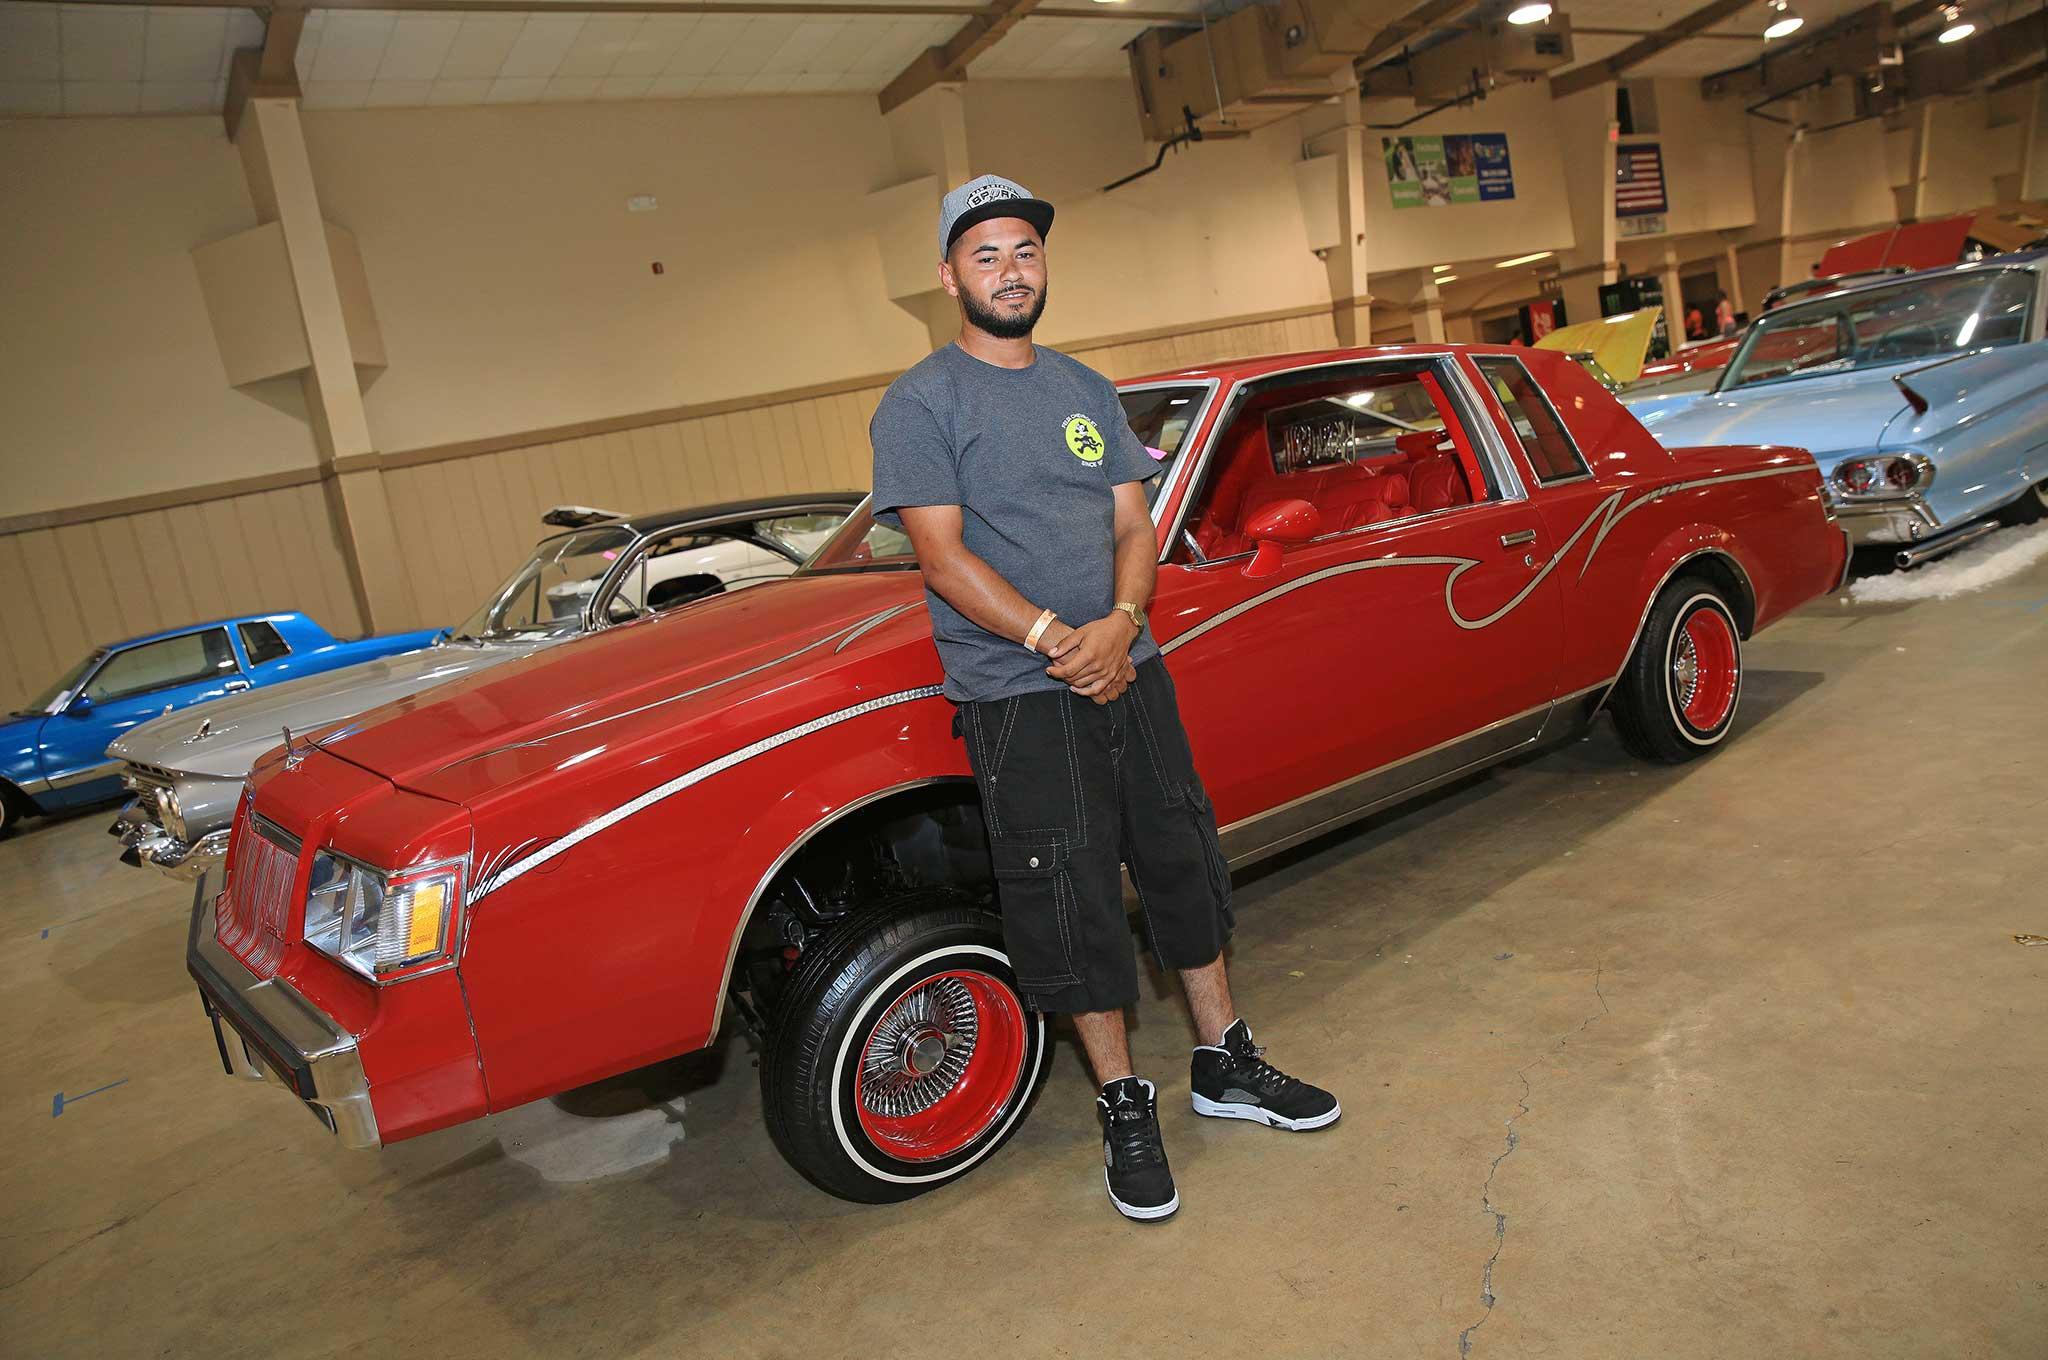 Lowrider Miami >> 2016 Miami Lowrider Super Show Red Regal Lowrider